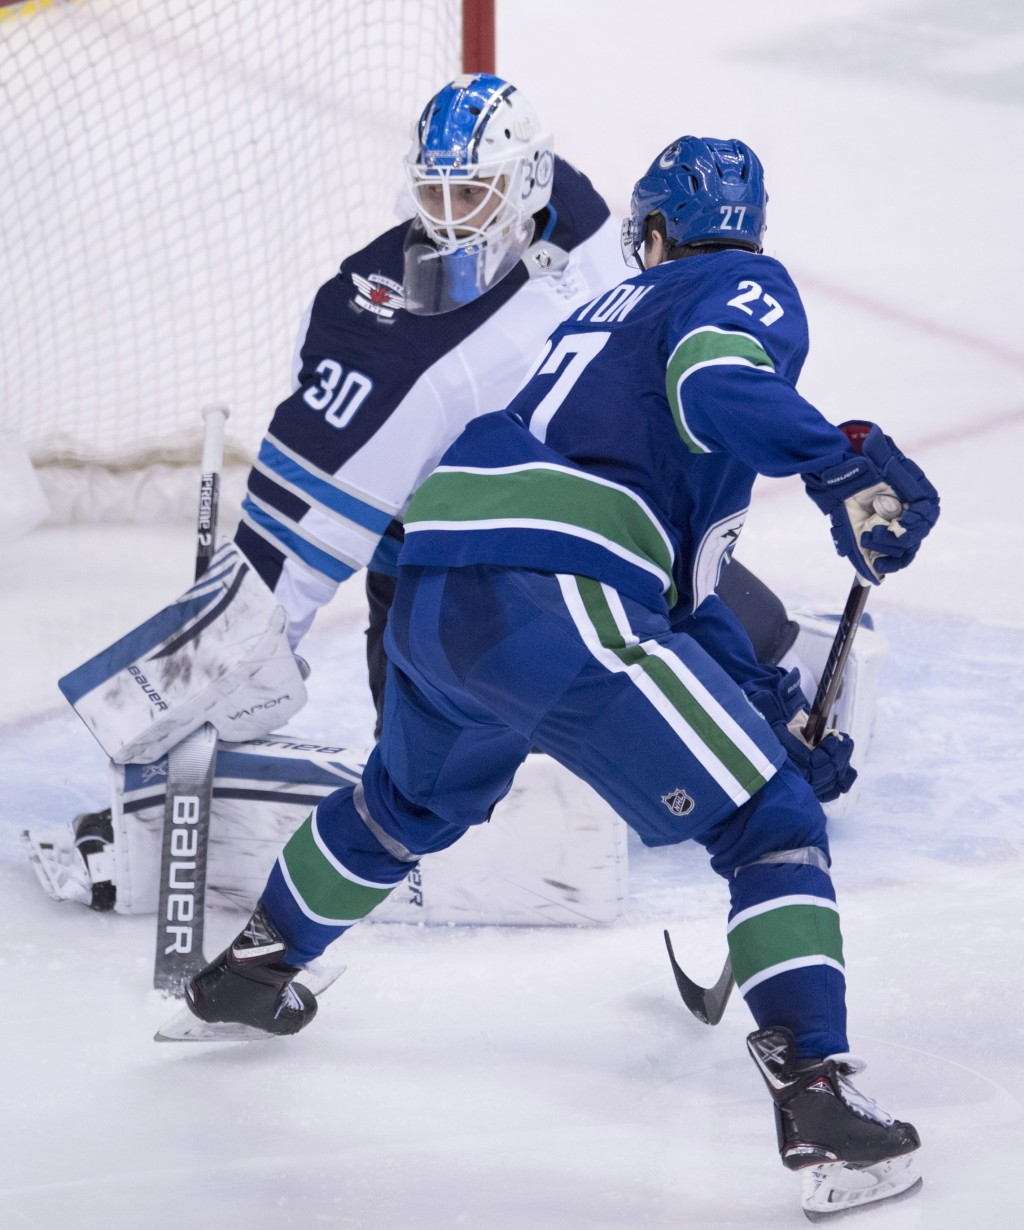 Vancouver Canucks defenseman Ben Hutton (27) tries to get a shot past Winnipeg Jets goaltender Laurent Brossoit (30) during the third period of an NHL...